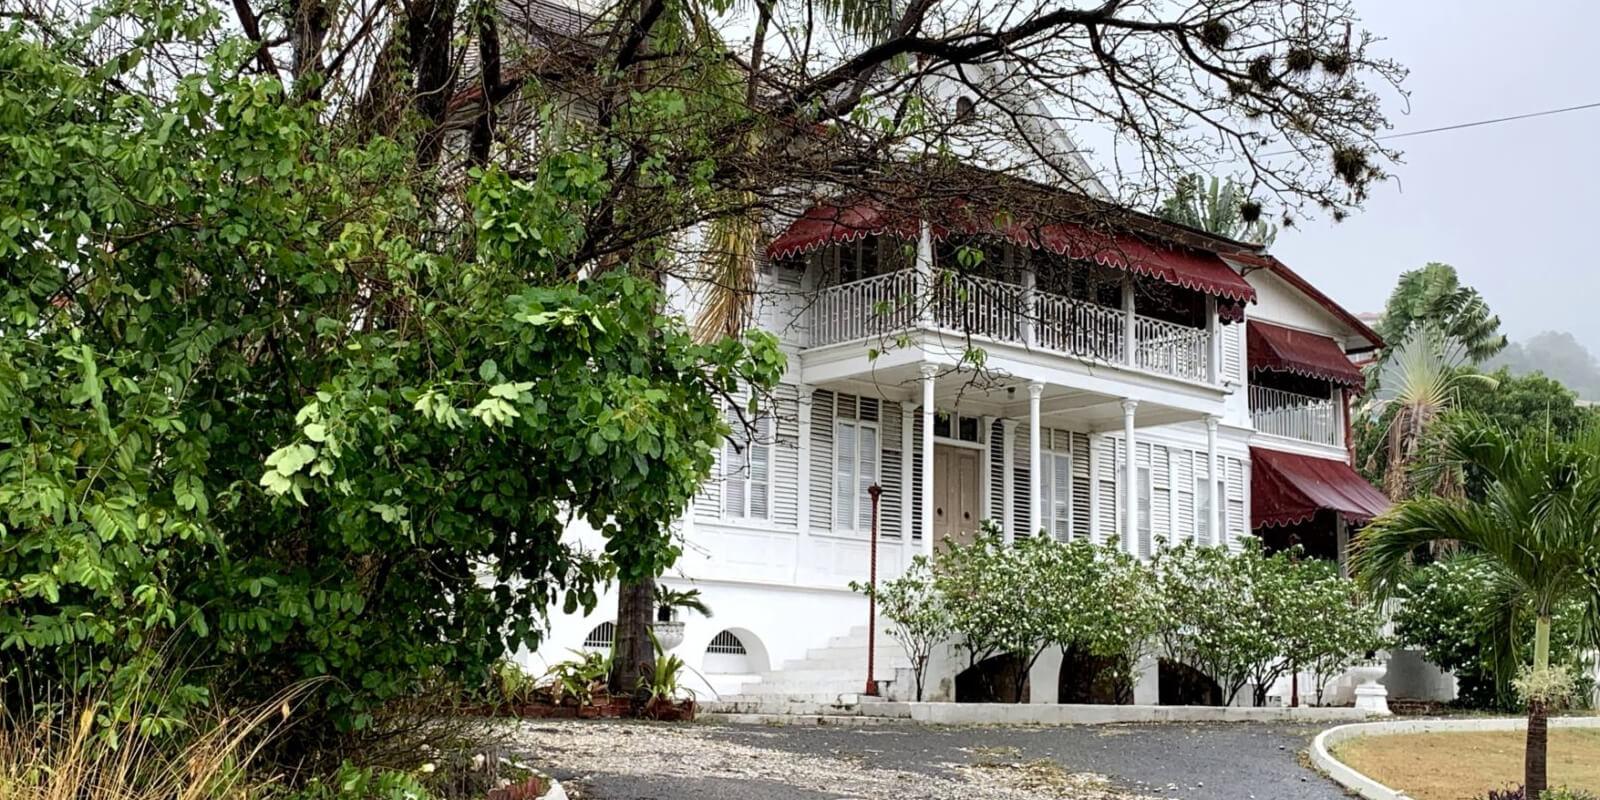 Cherry Gardens Great House - Jamaica Great Houses